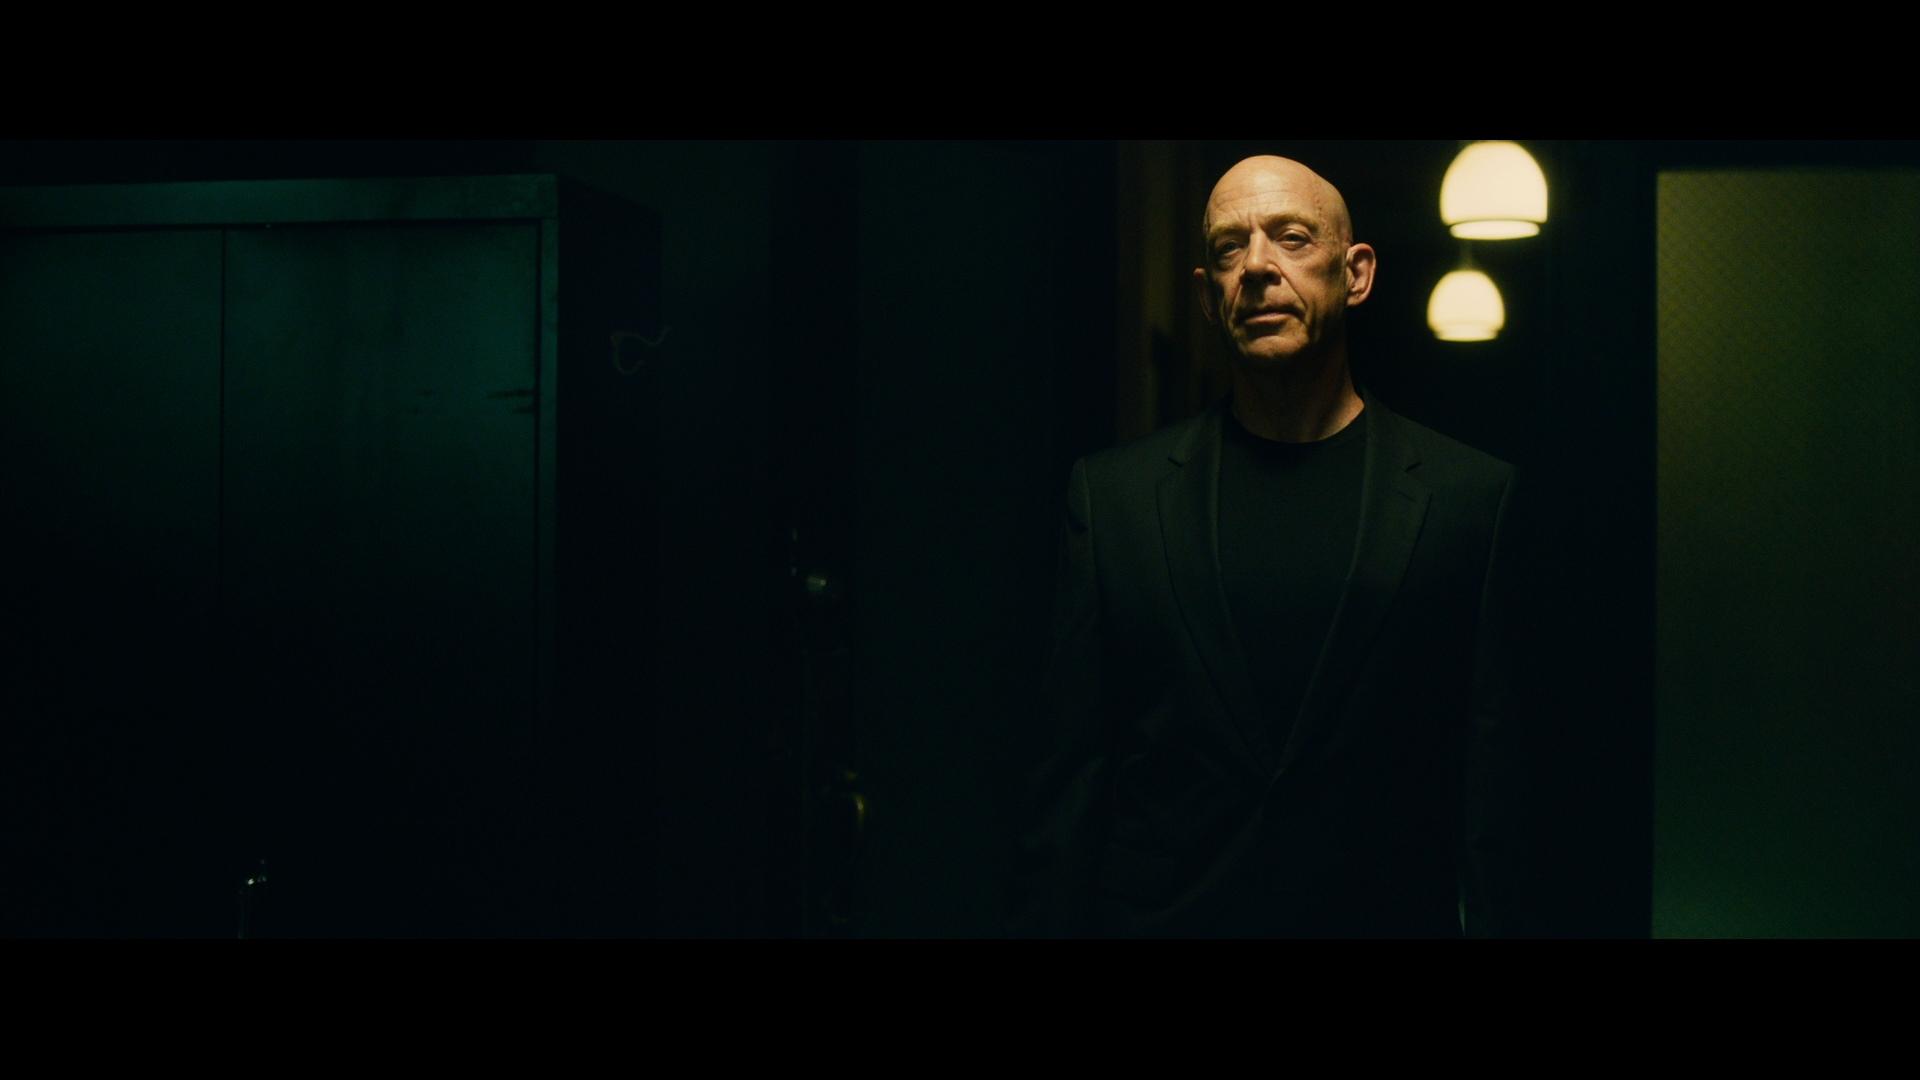 https://i0.wp.com/www.dvdbeaver.com/film5/blu-ray_reviews_66/whiplash_blu-ray_/large/large_whiplash_01_blu-ray_.jpg